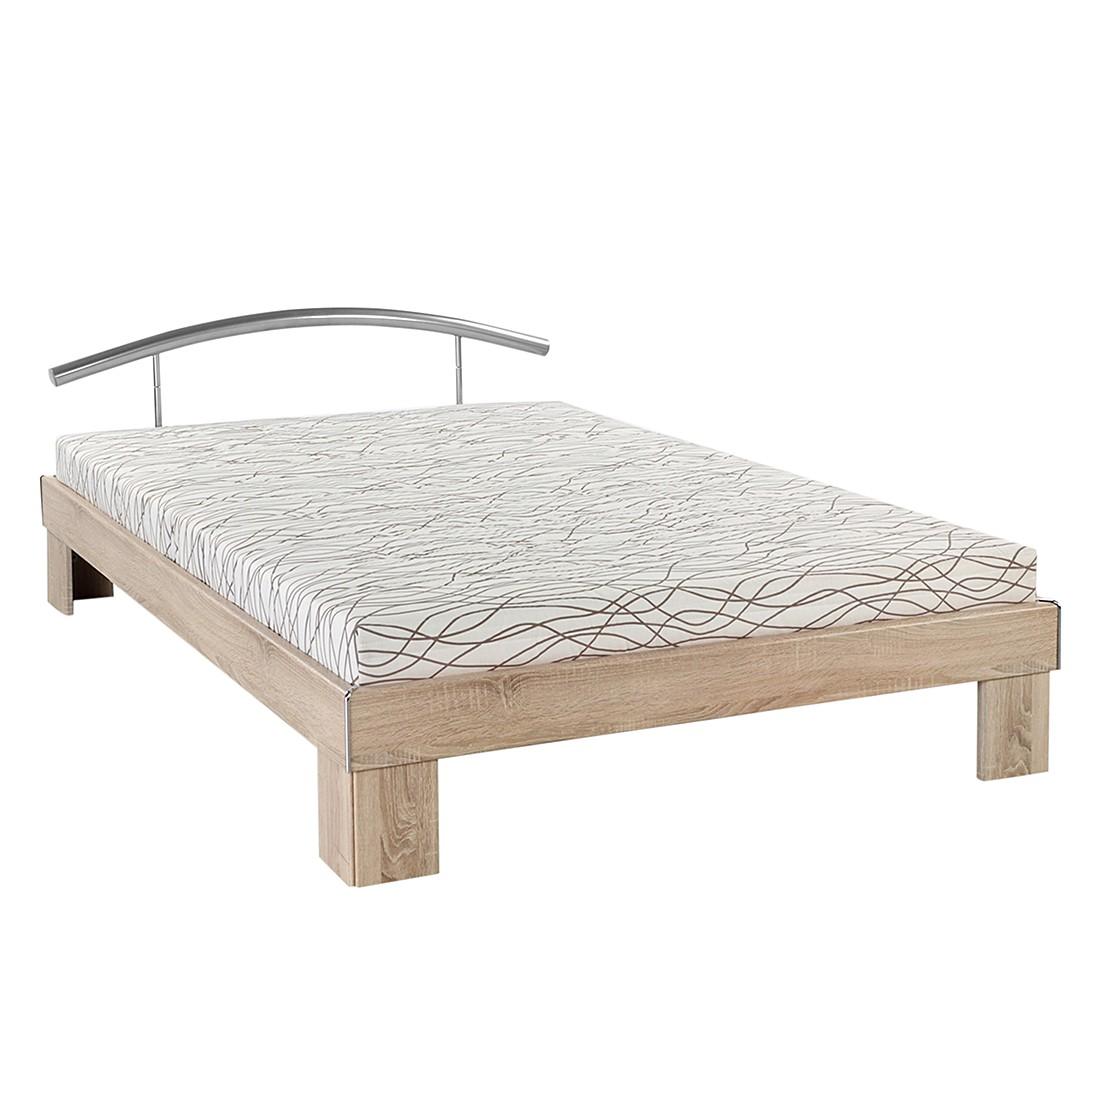 Lit futon Lennox - Imitation chêne brut de sciage, mooved